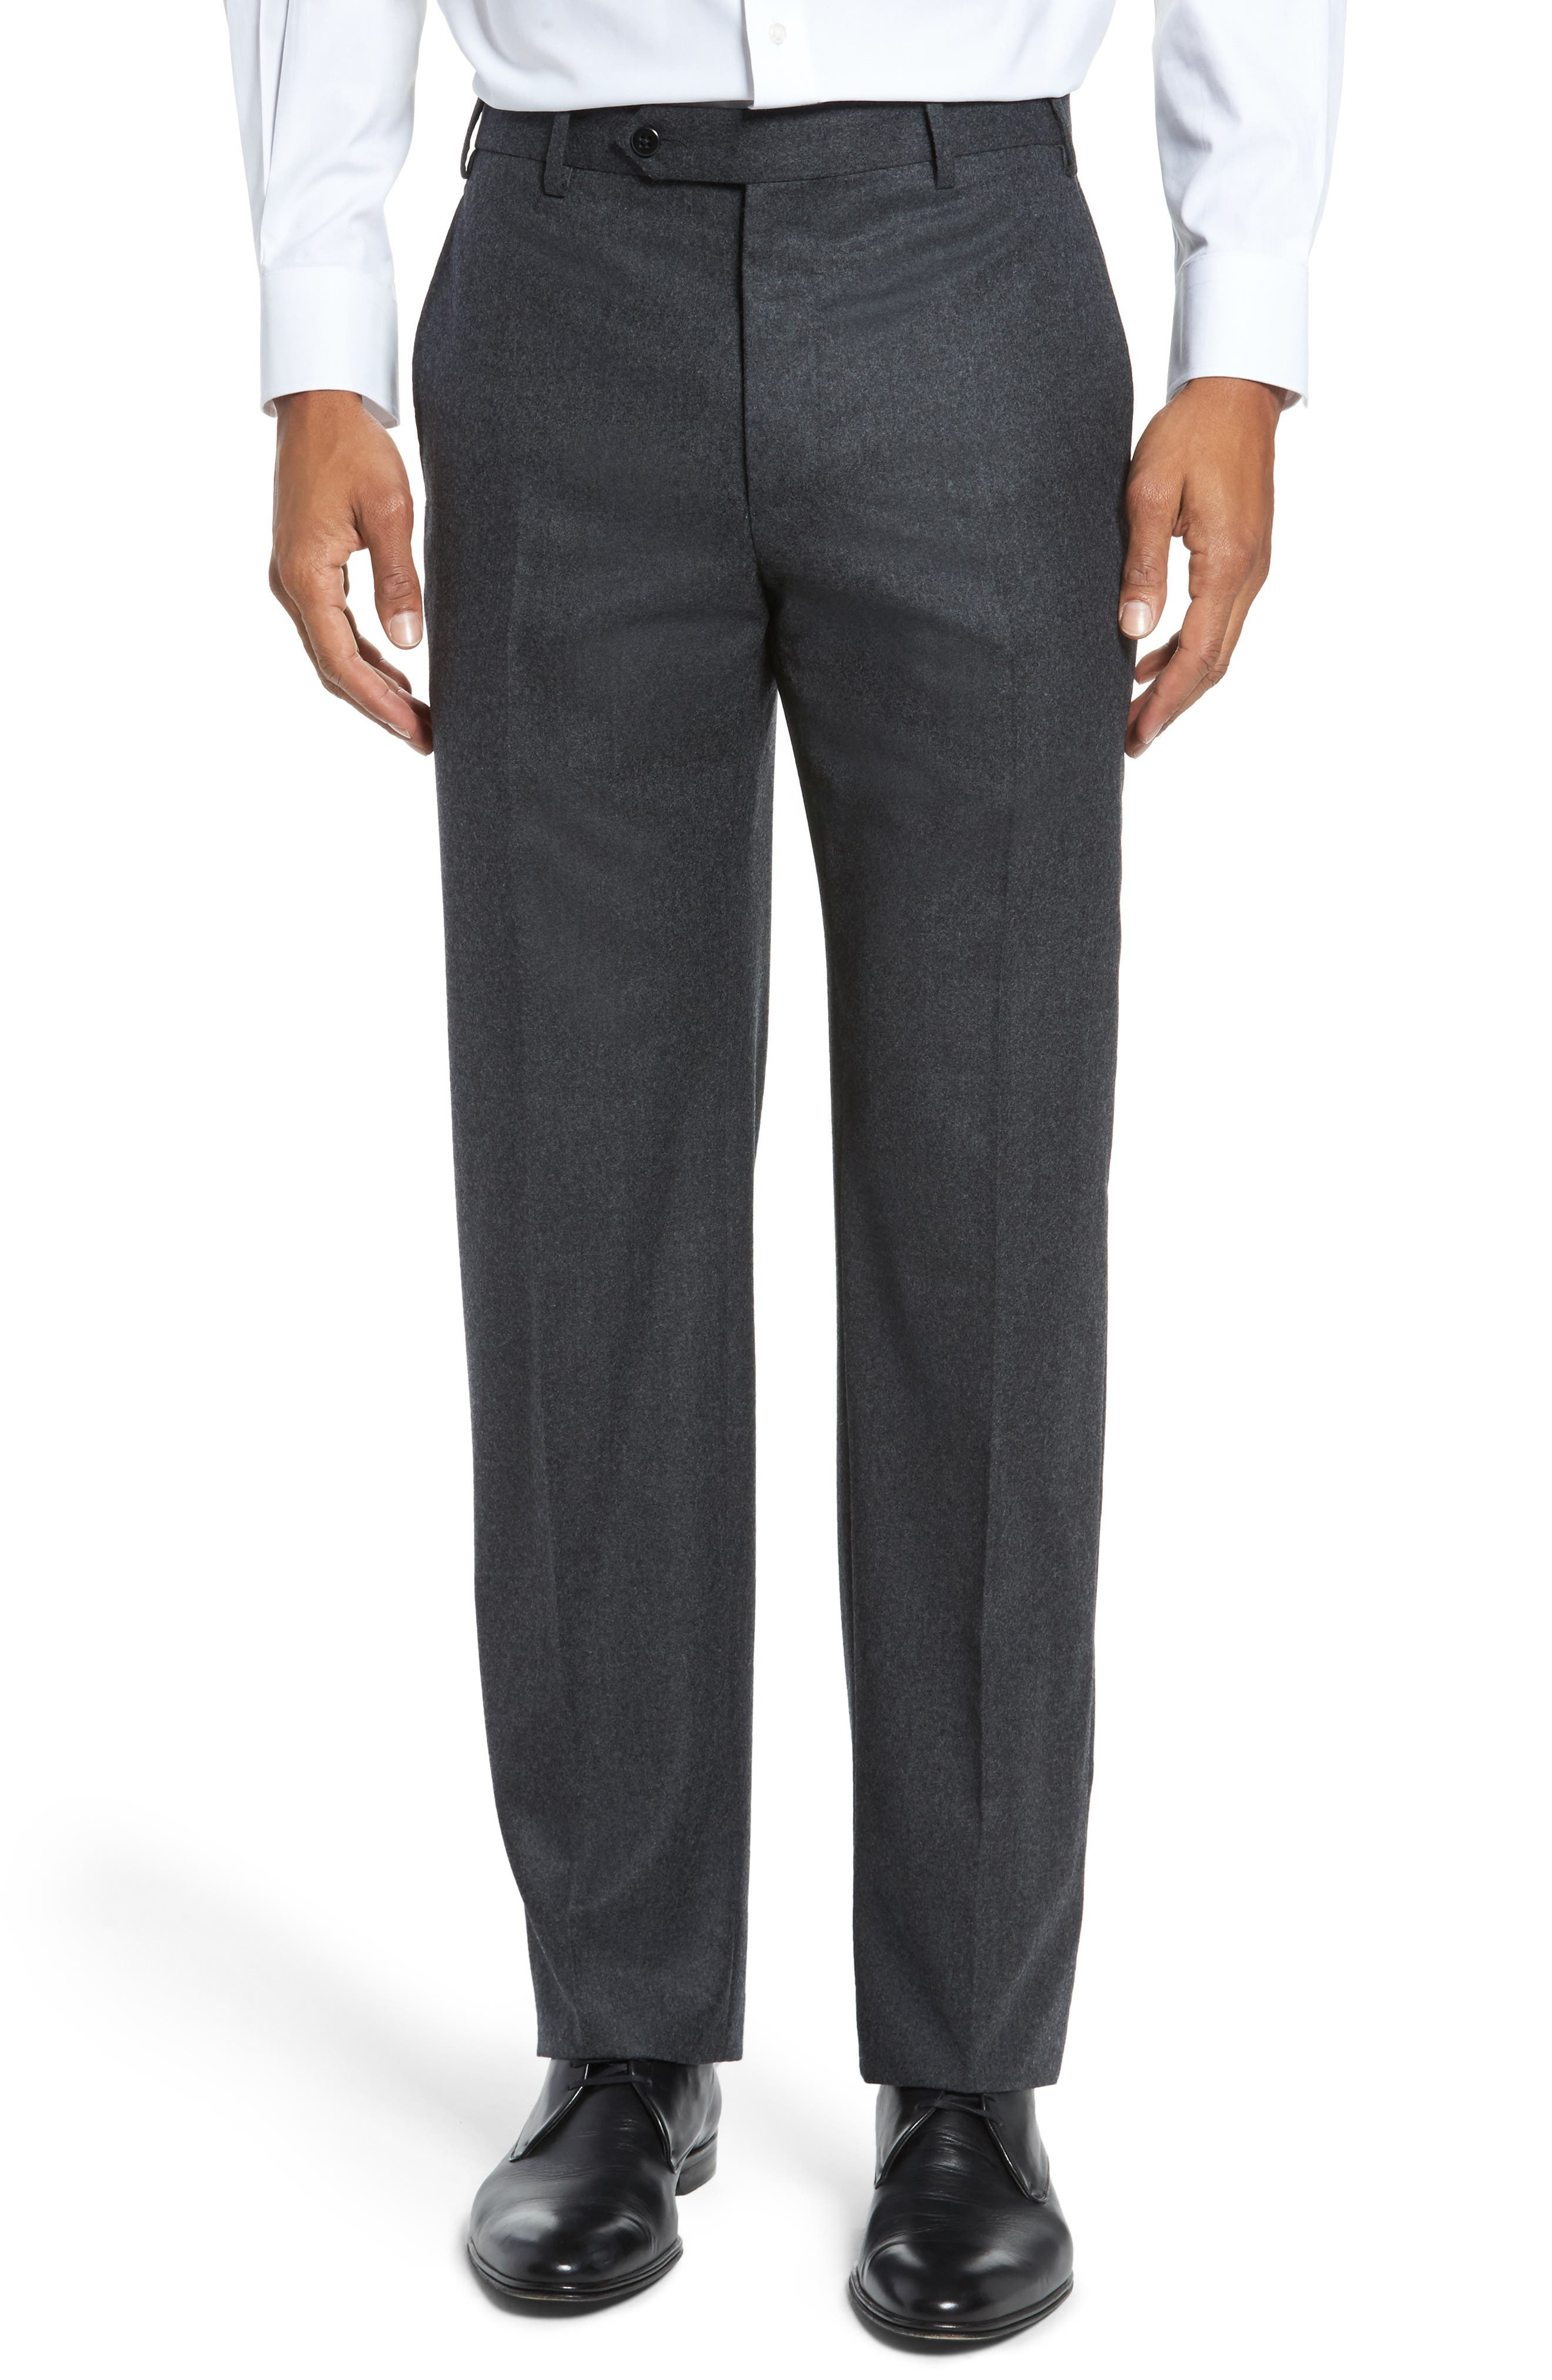 Alternate Image 1 Selected - Zanella Devon Flat Front Solid Wool Flannel Trousers